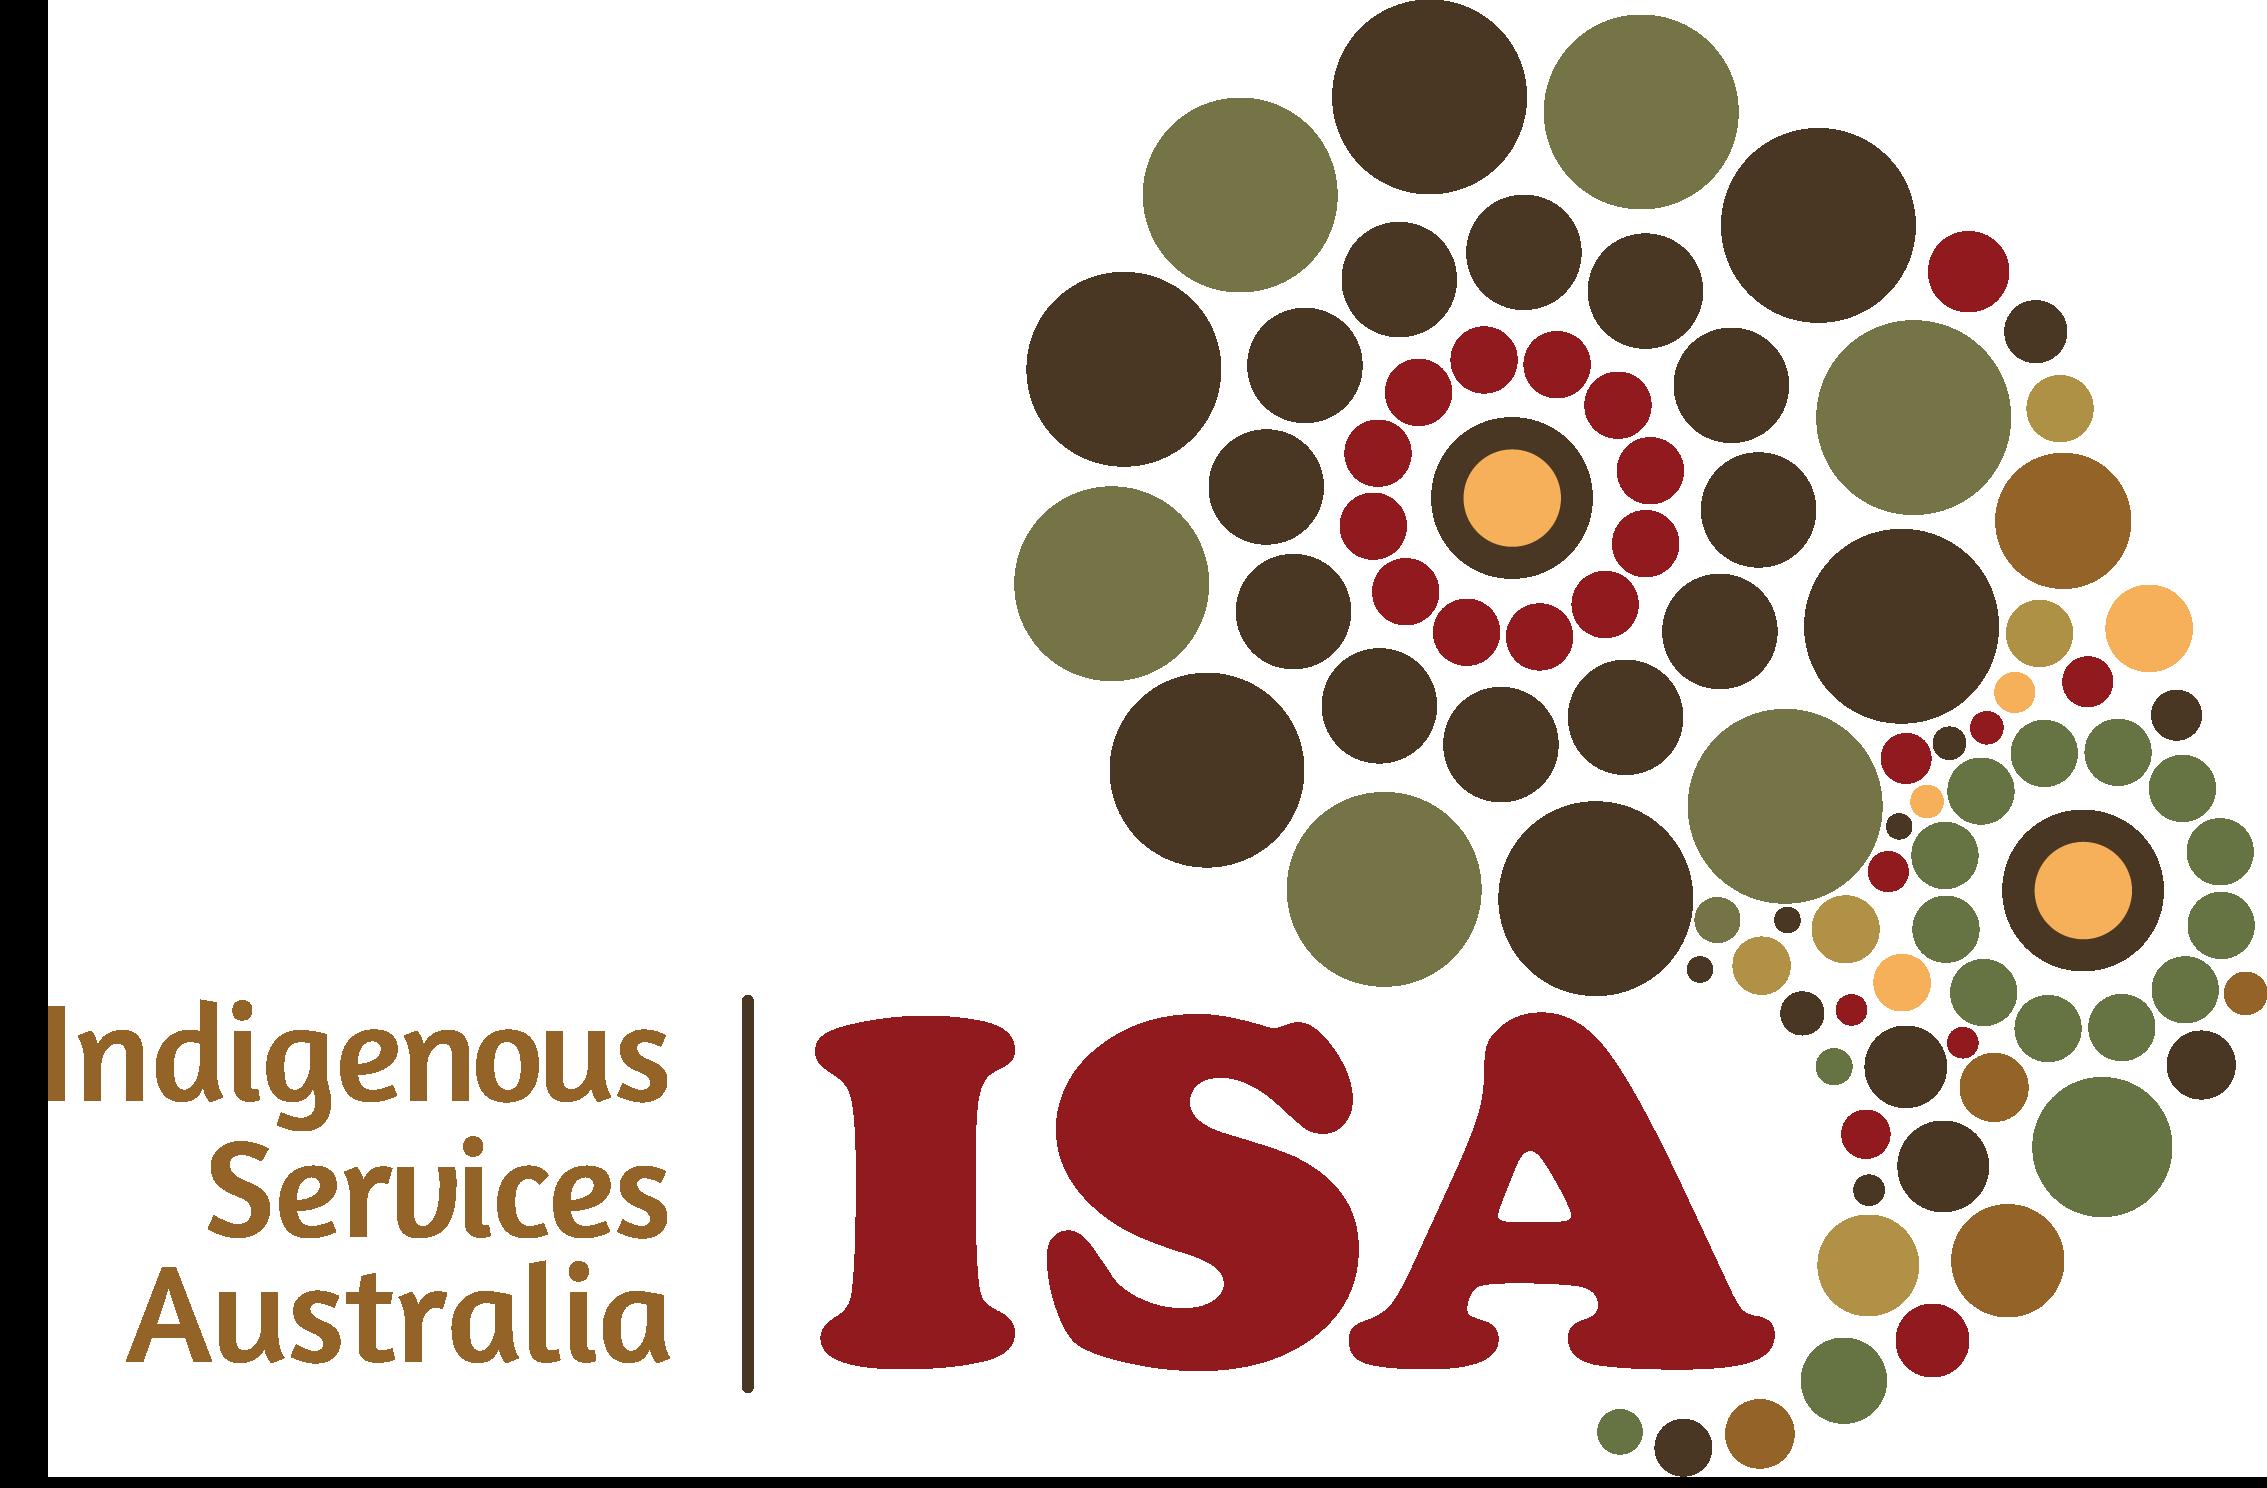 Indigenous Services Australia